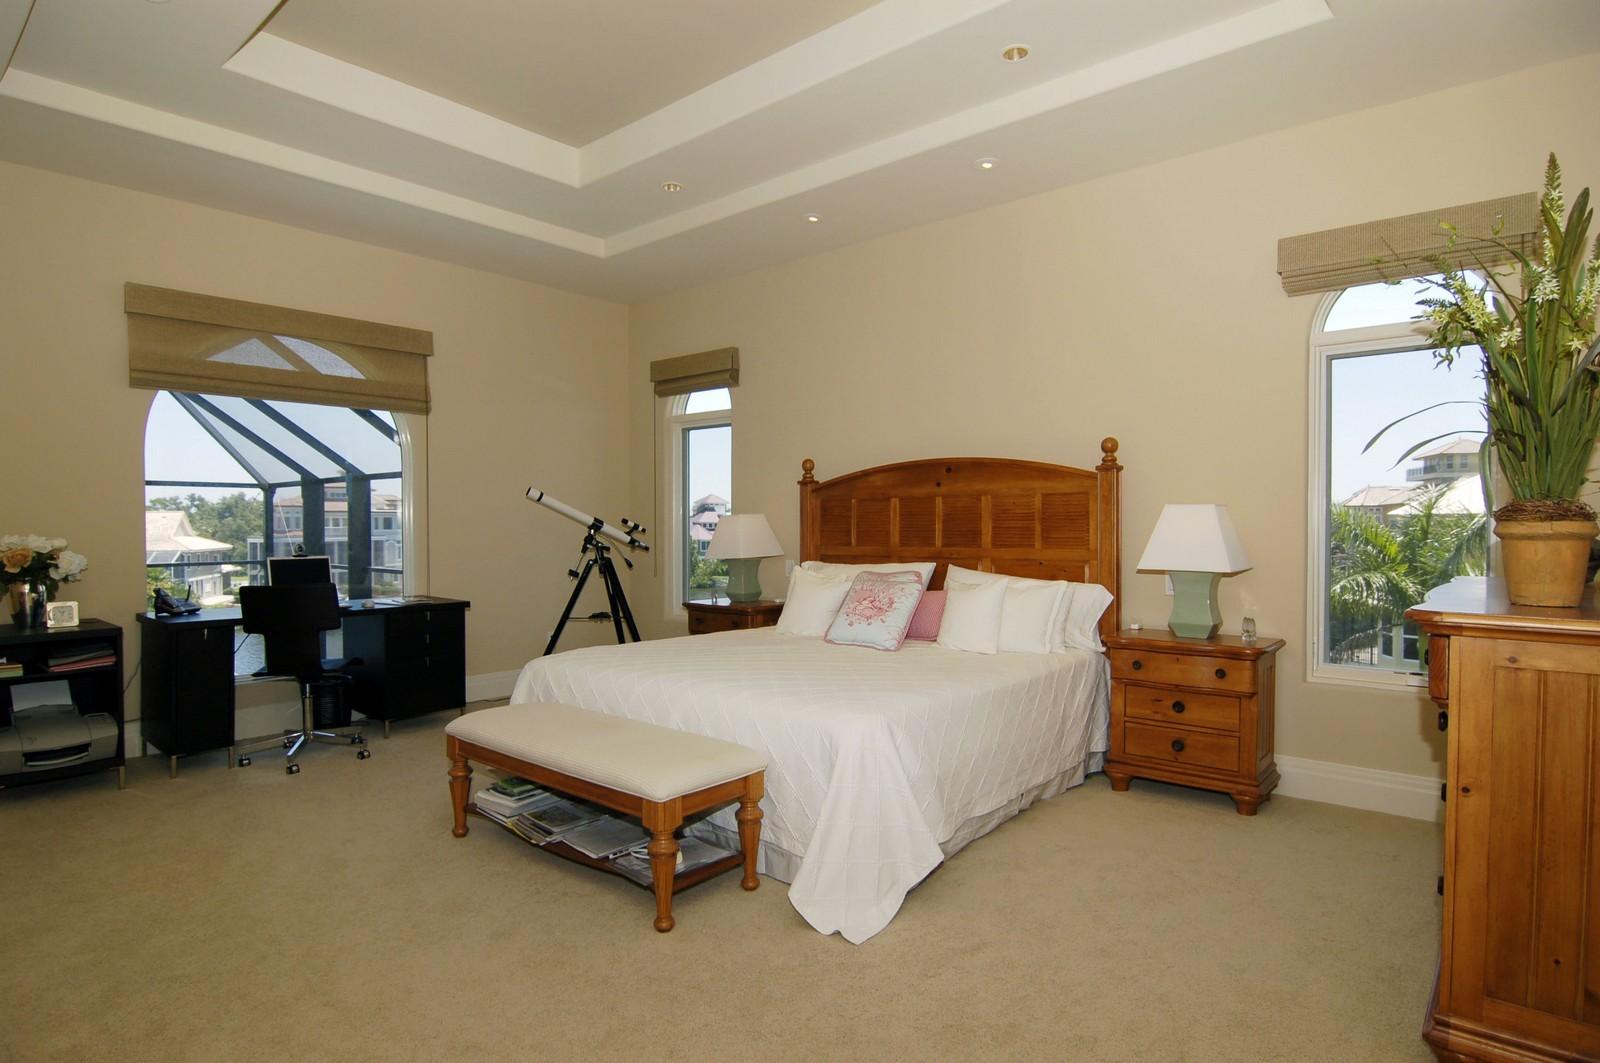 Real Estate Photography - 222 Barefoot Beach Blvd, Bonita Springs, FL, 34134 - Master Bedroom